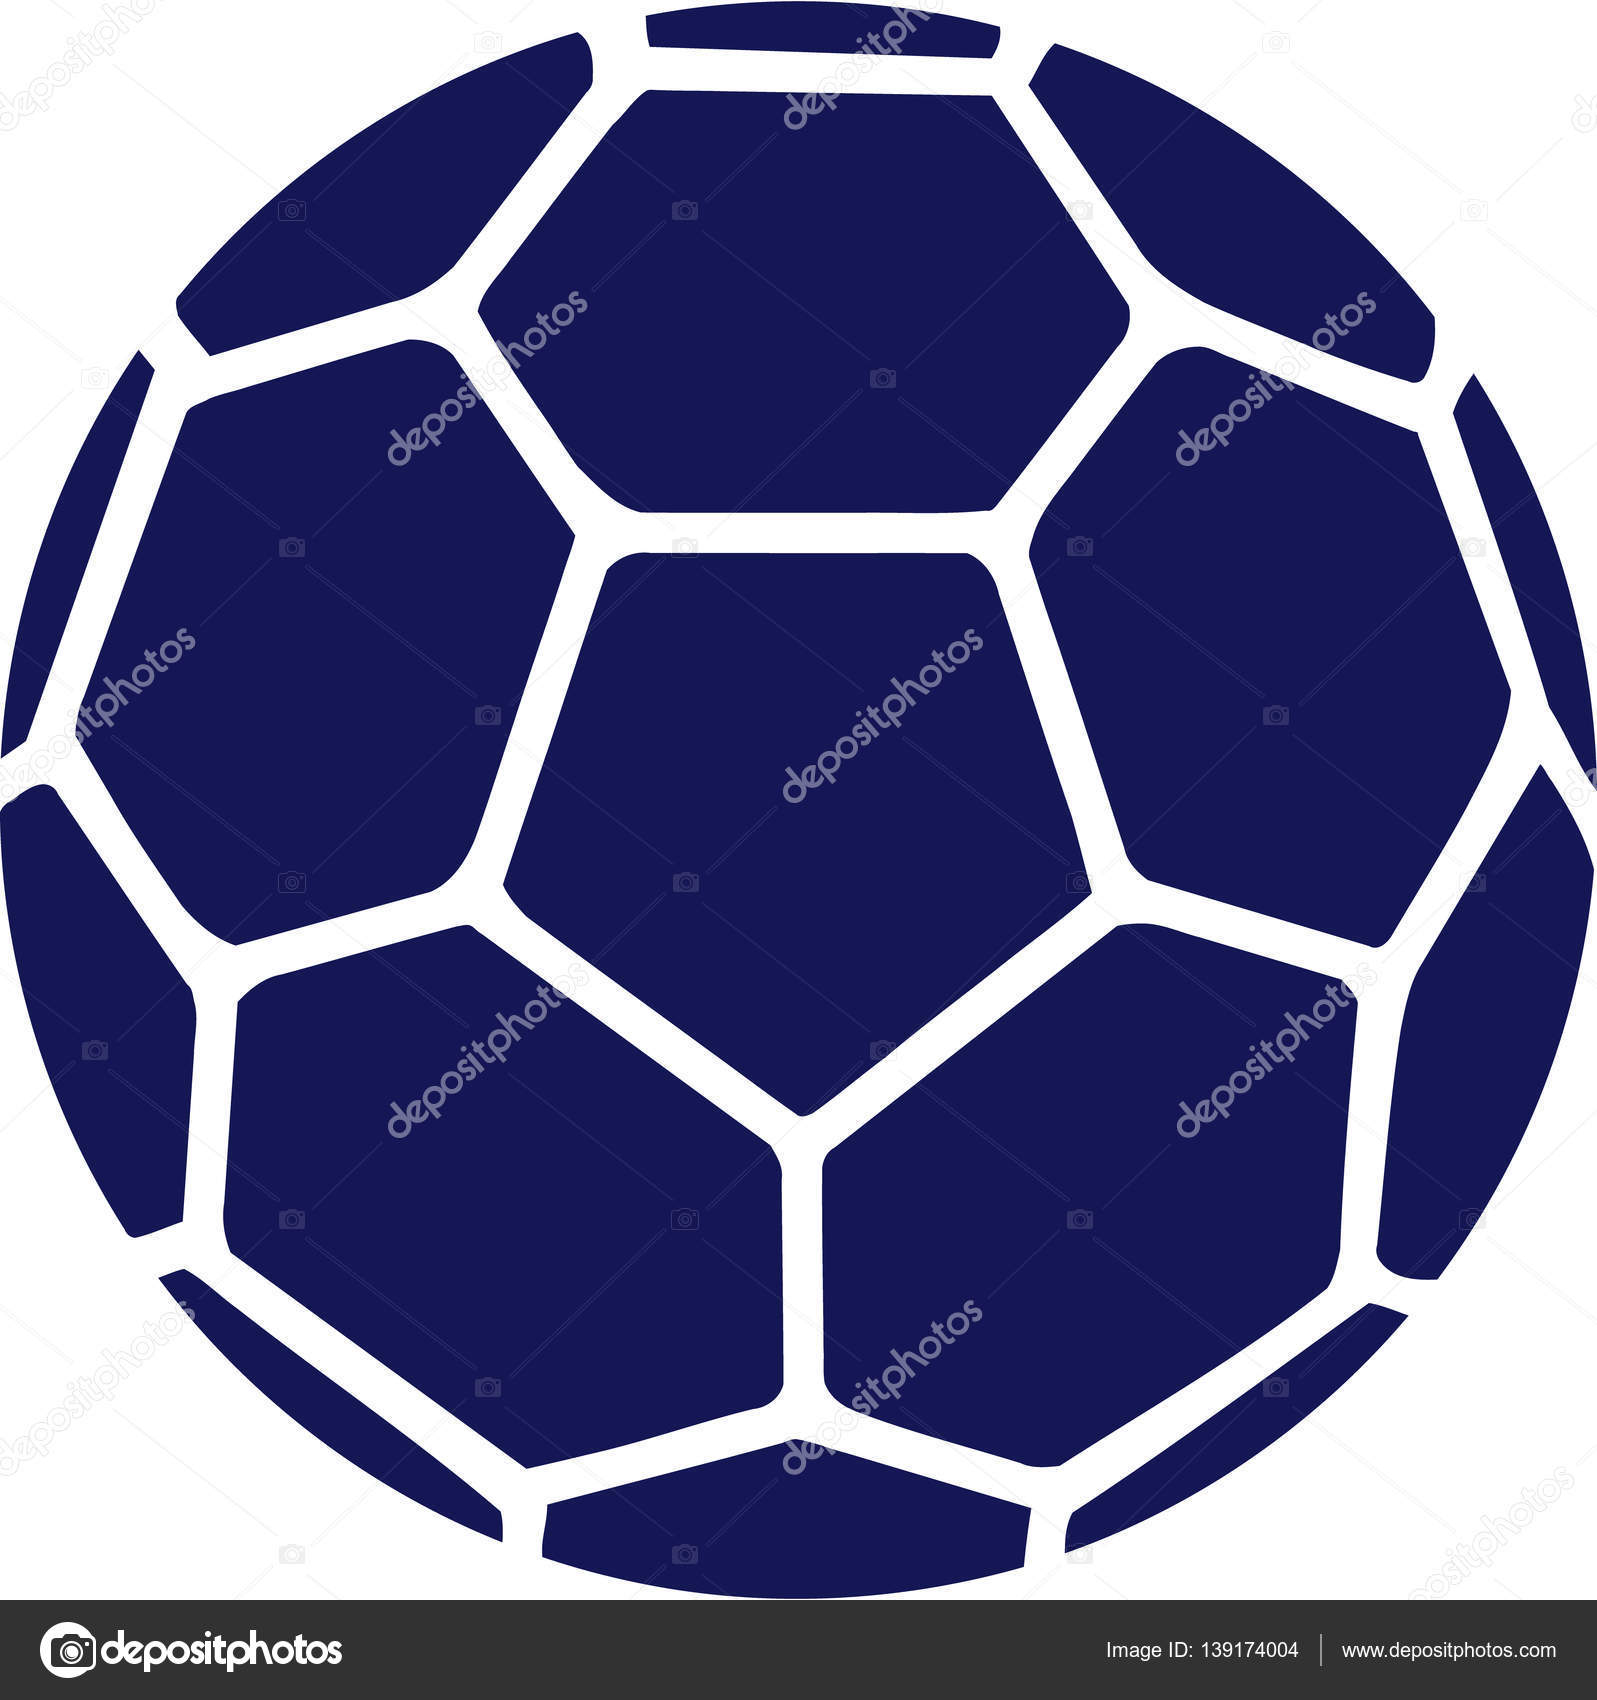 Deporte pelota azul de Balonmano - imágenes  pelotas de hambol — Vector de  miceking — Vector de miceking 9de4d199ad5c